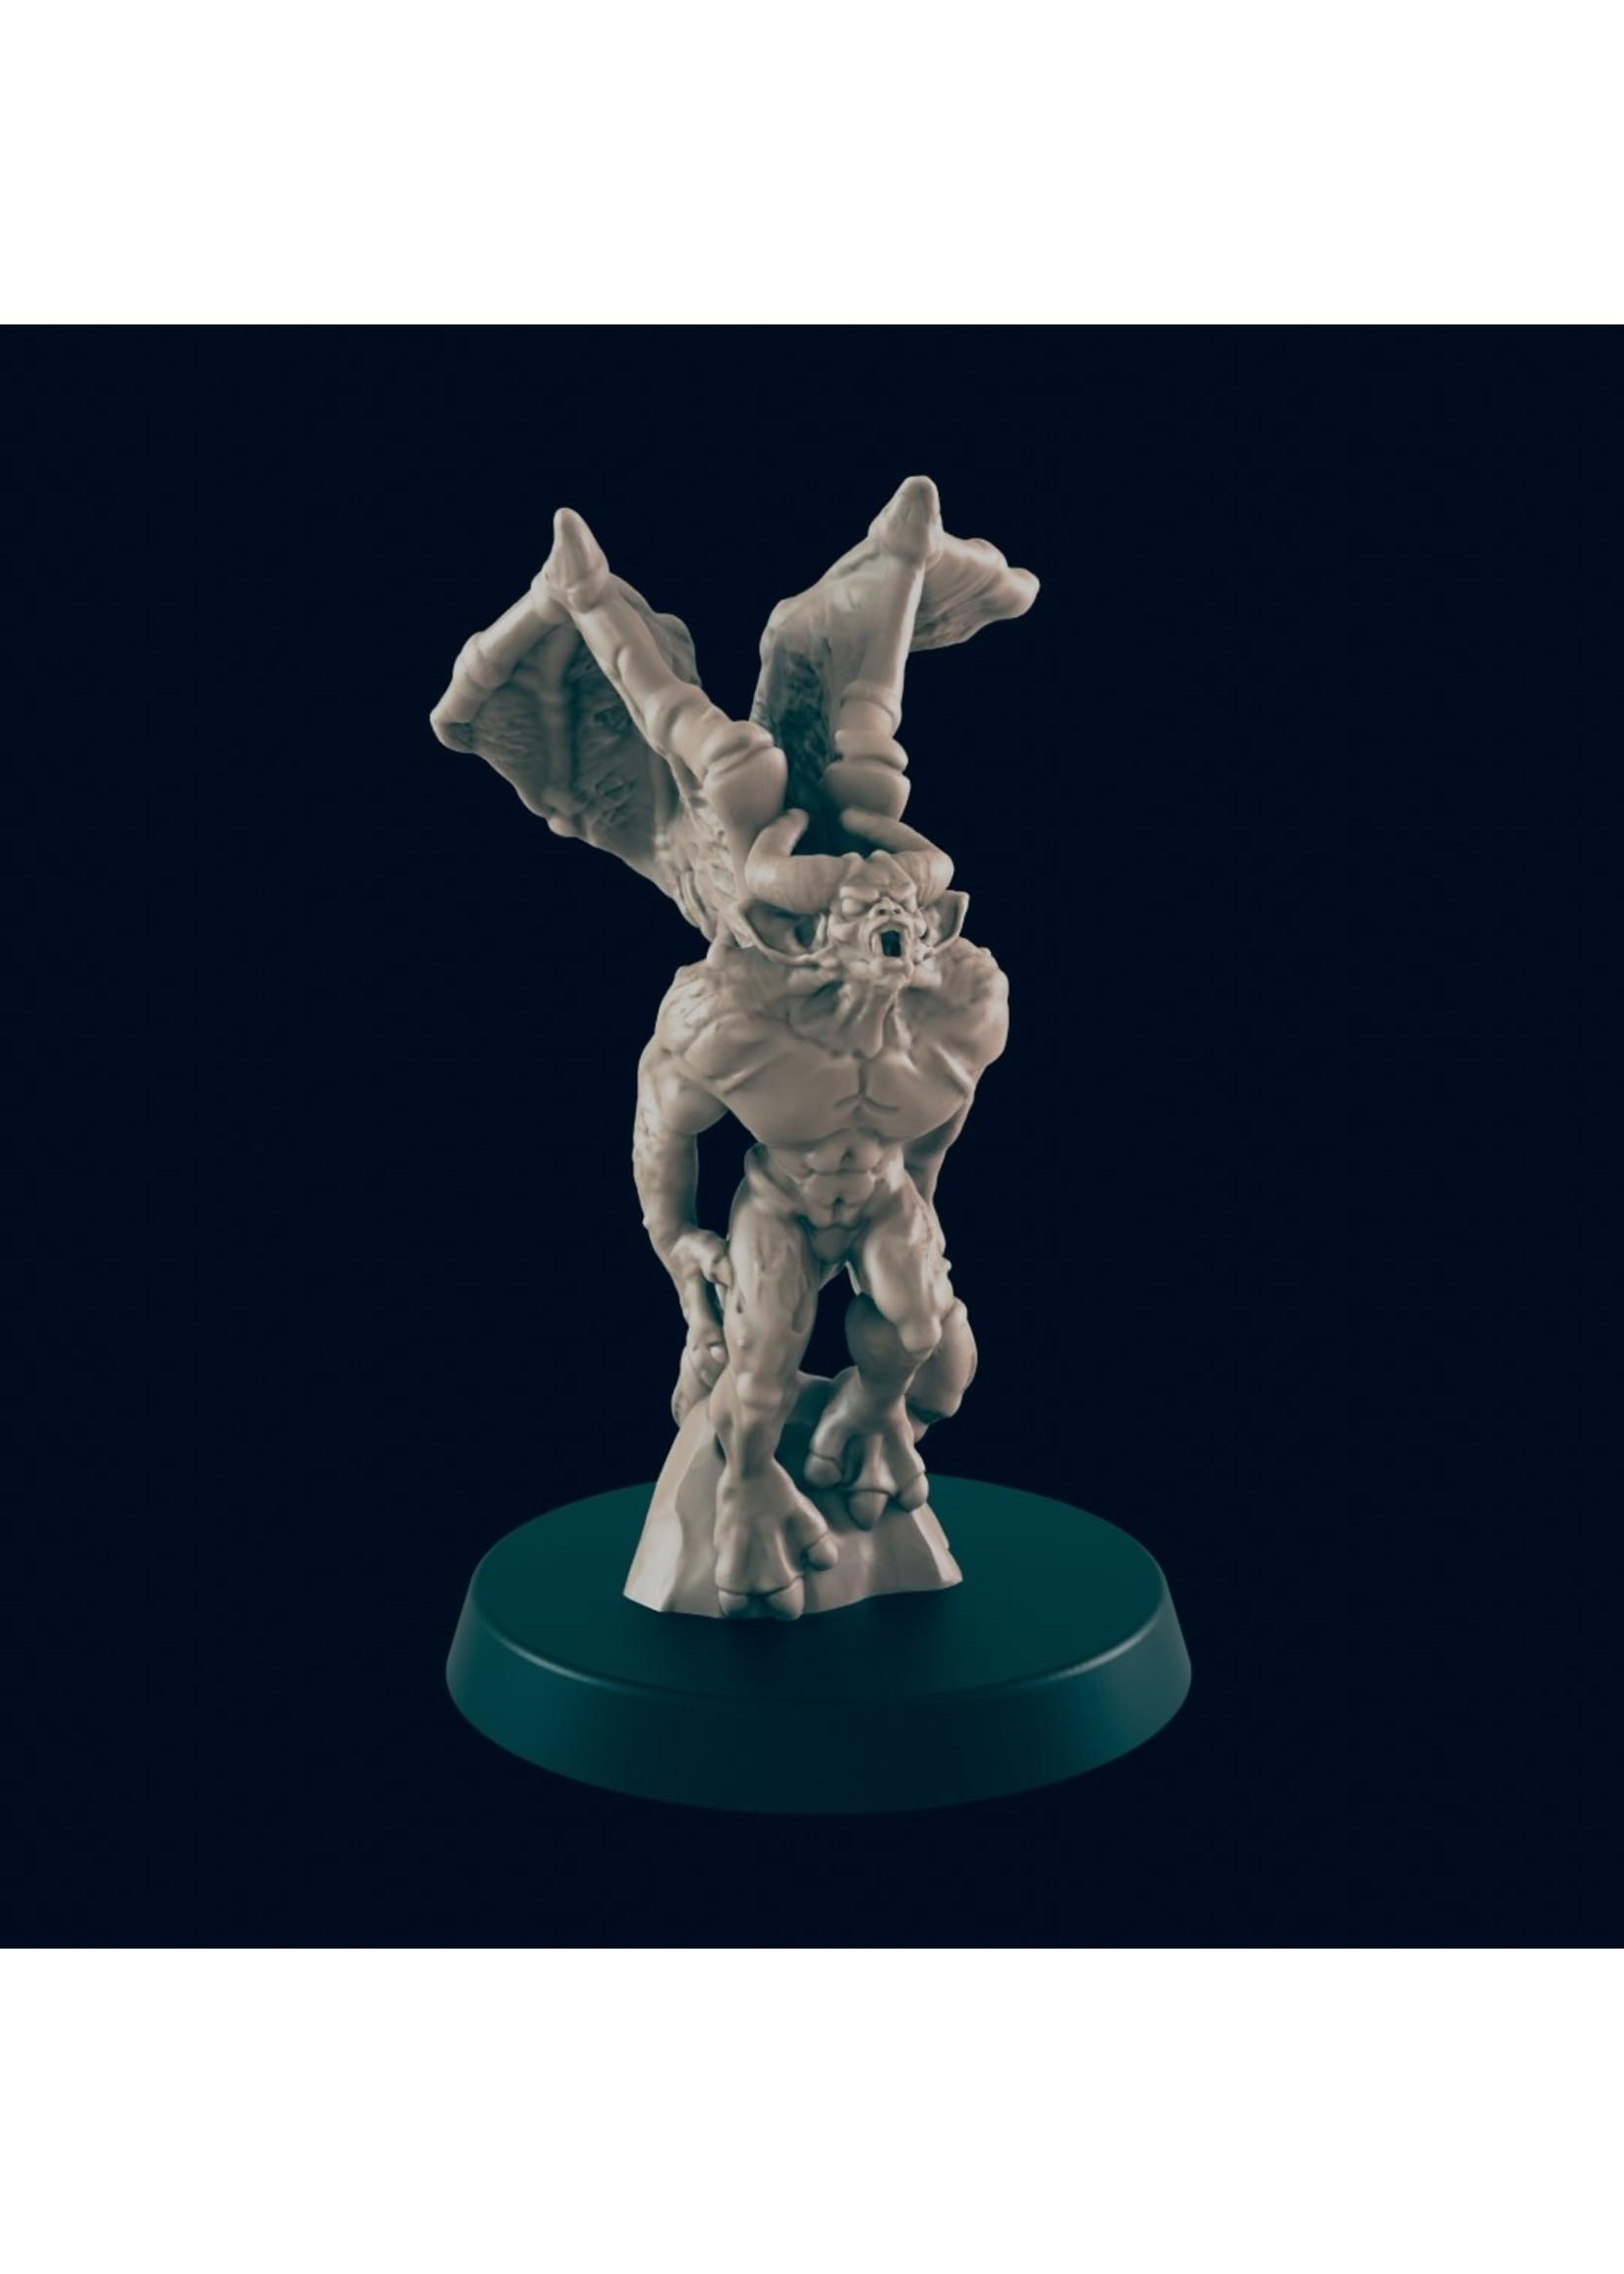 3D Printed Miniature - Imp 2 - Dungeons & Dragons - Beasts and Baddies KS